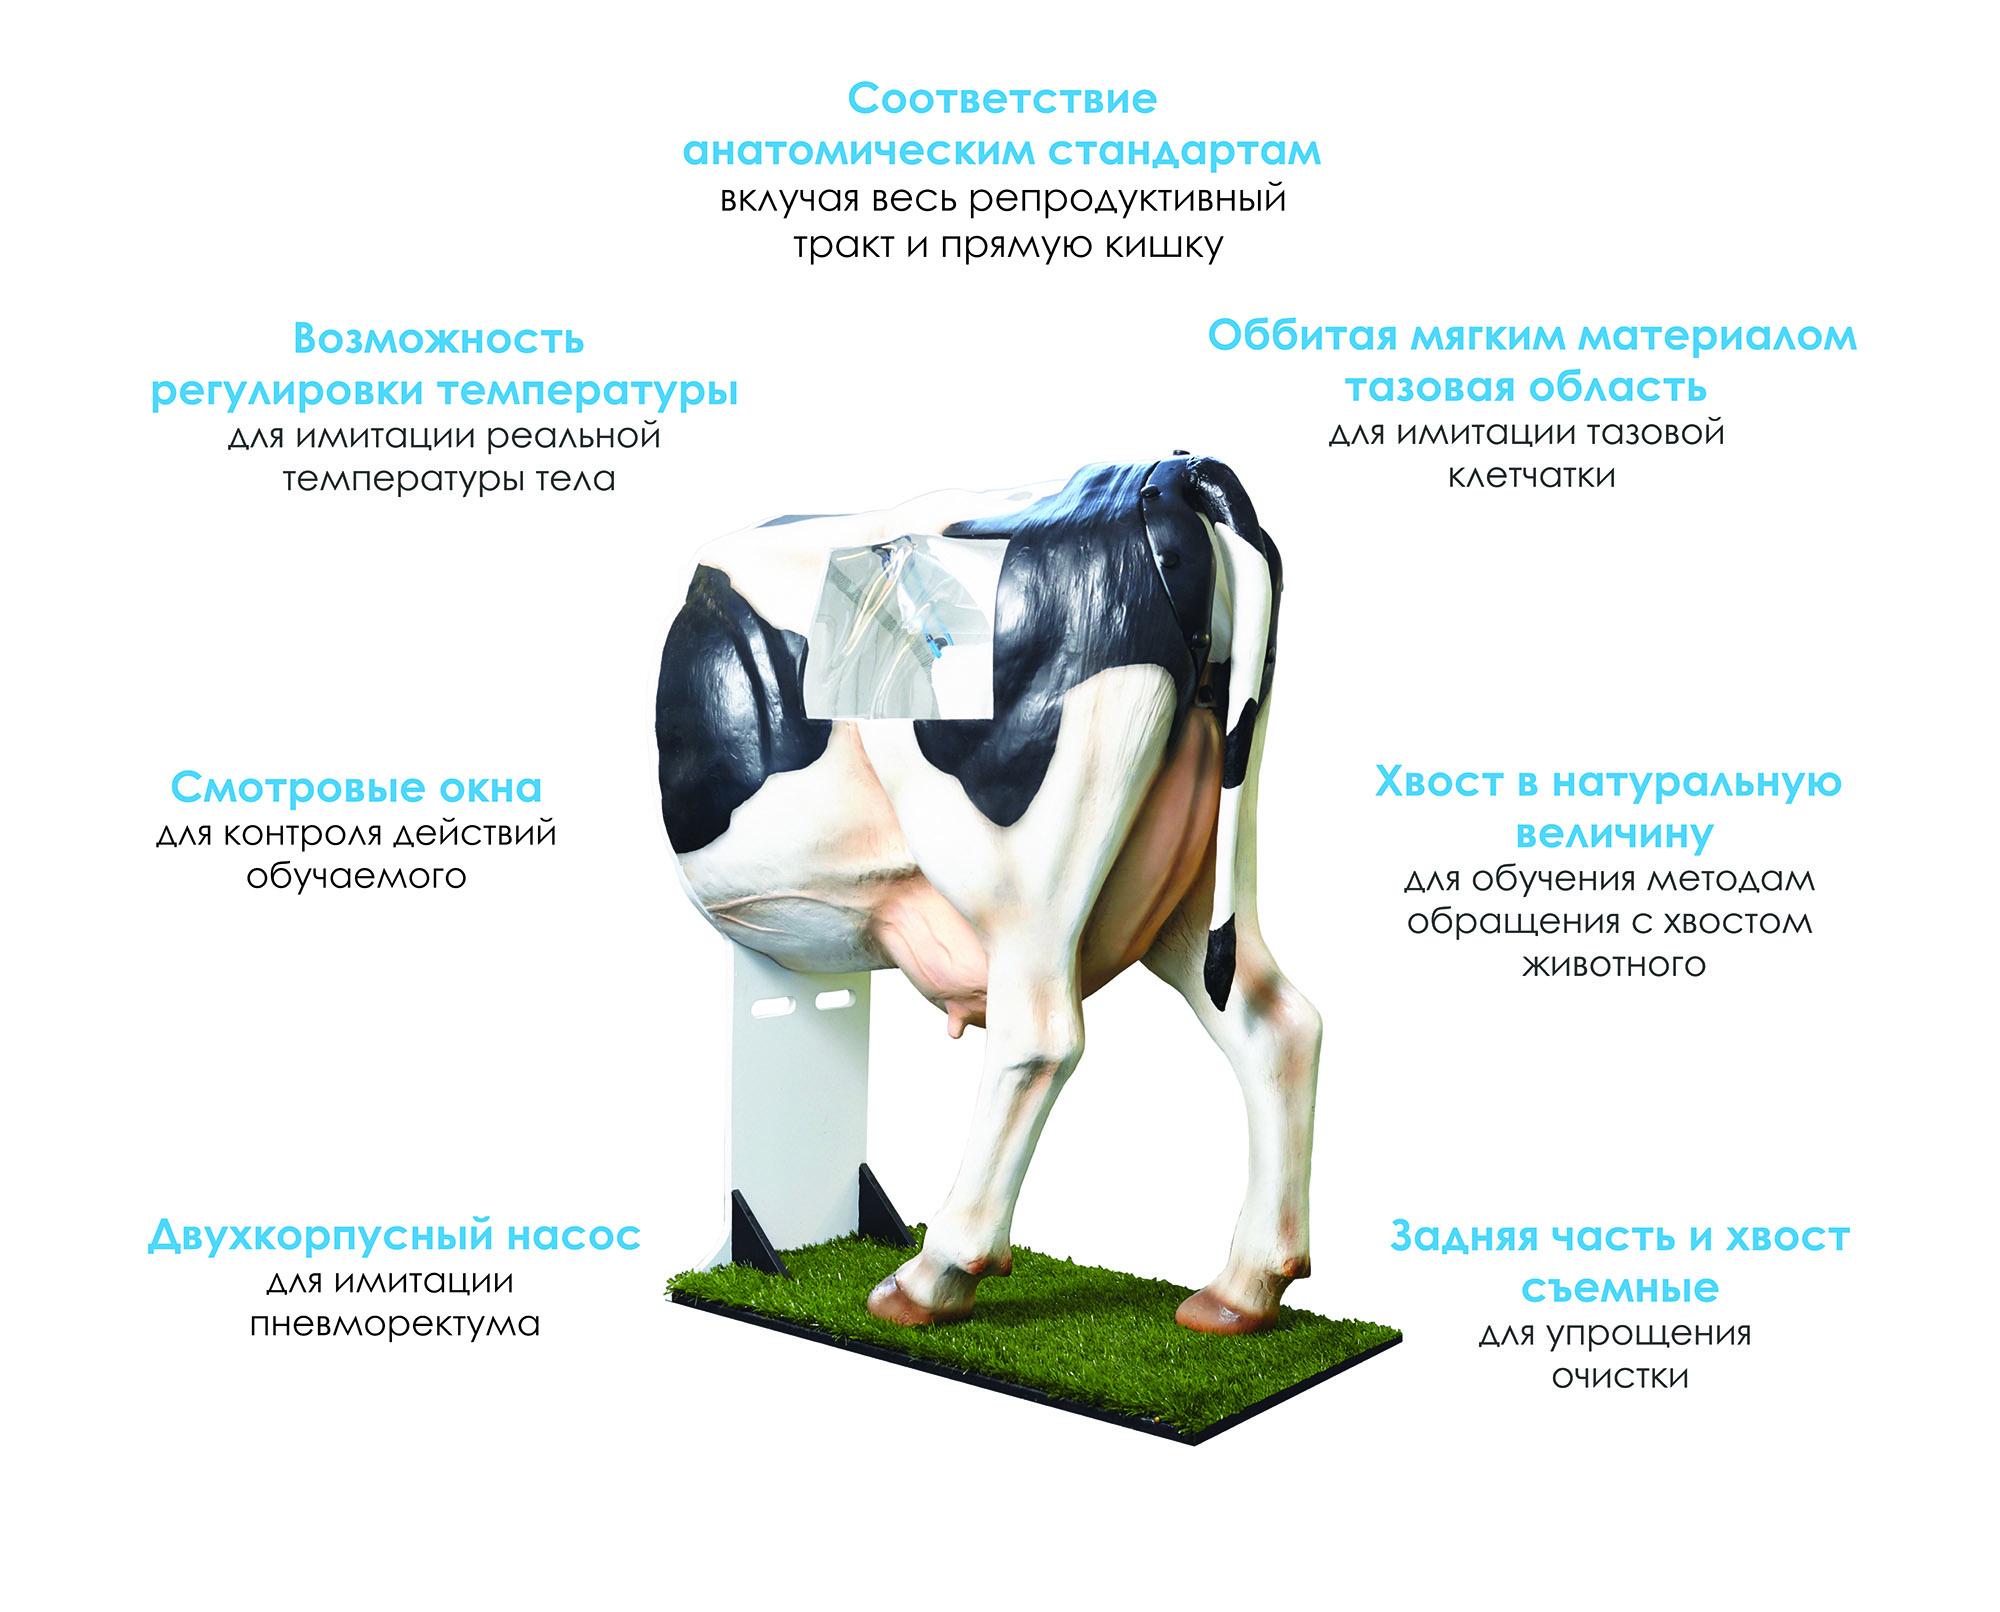 henryetta-cow-artificial- minitube-vetlikar